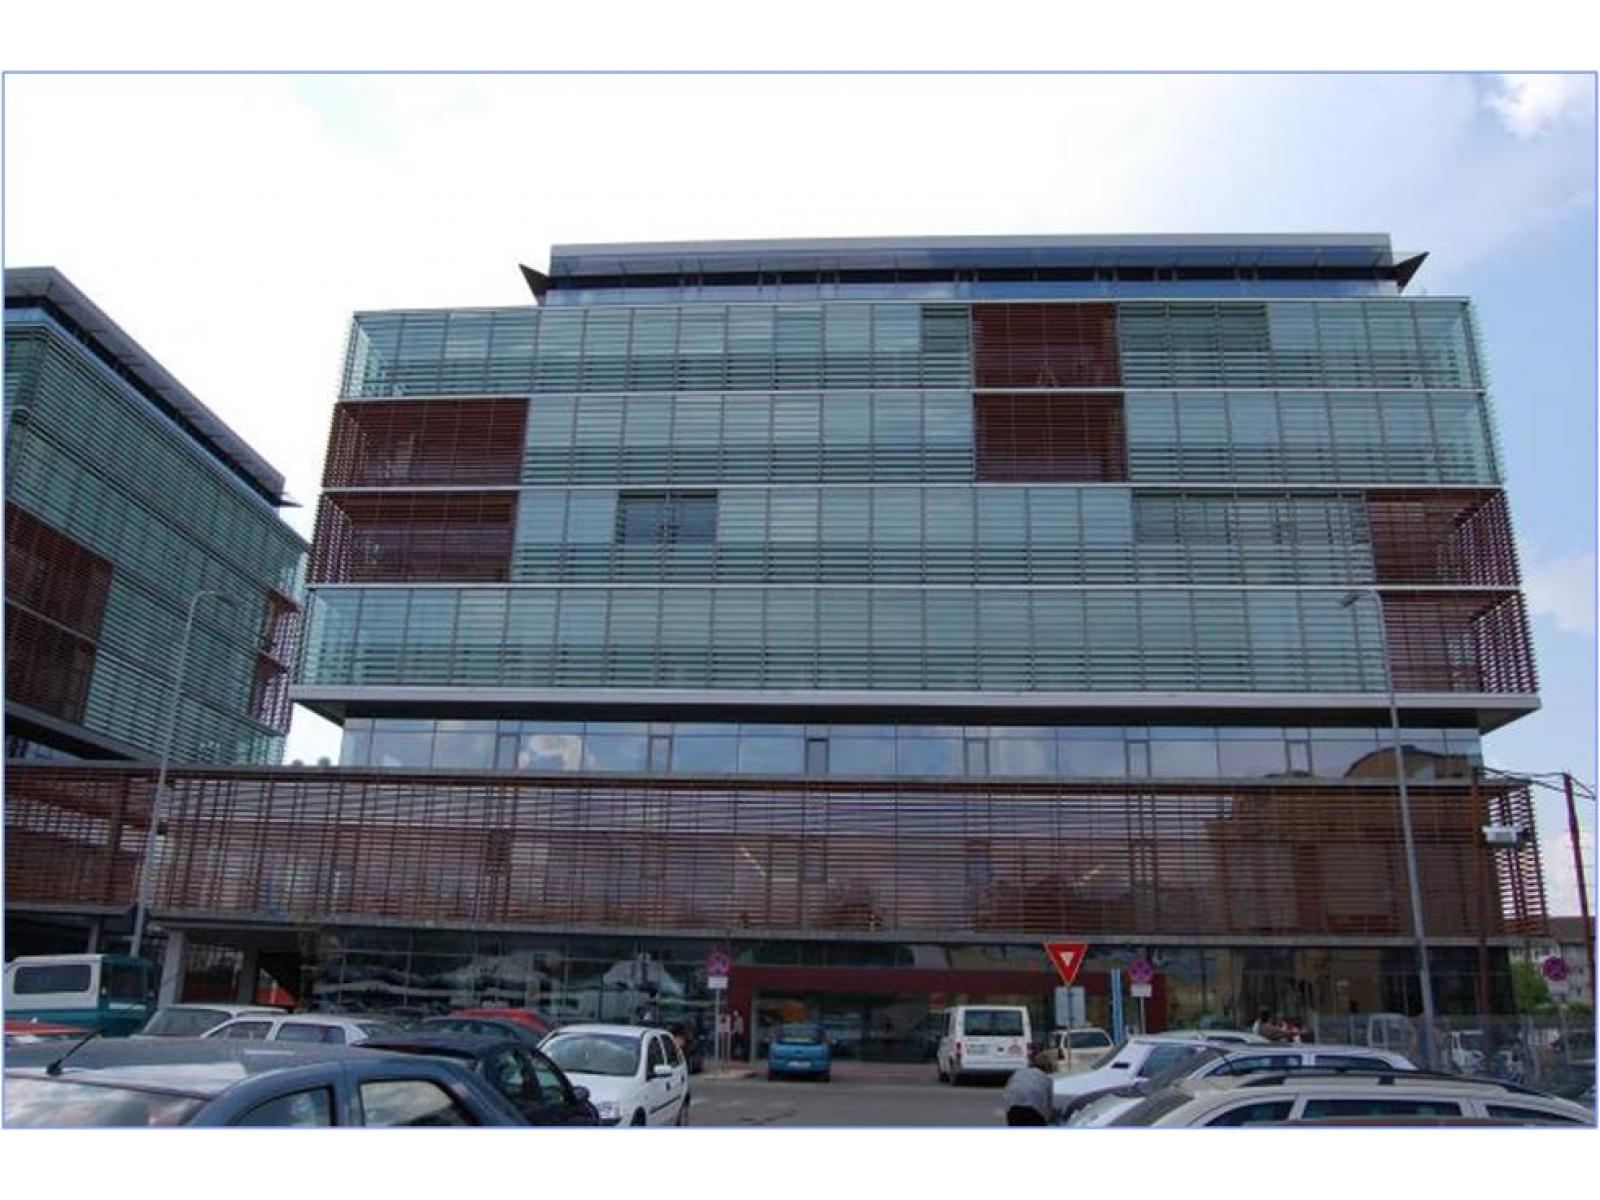 Centrul Medical Dr Grigoras - P700.JPG